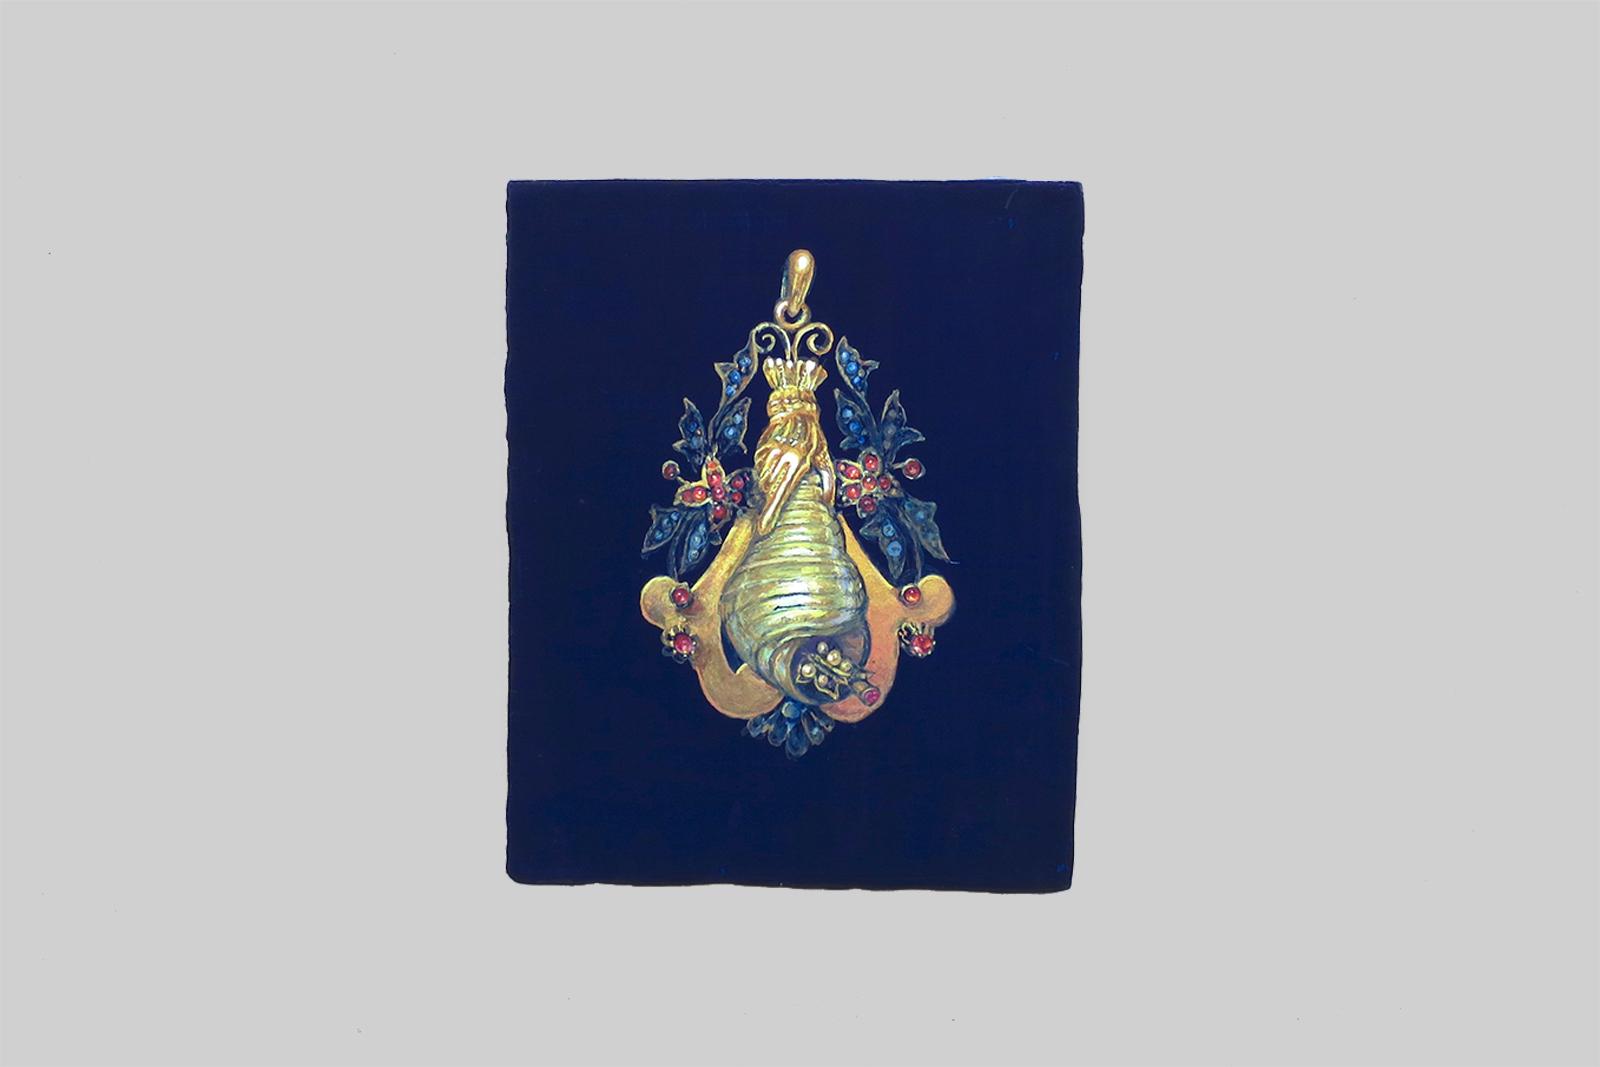 a joia da avó, 2010, tempera/paneel, 18 x 14,5 cm